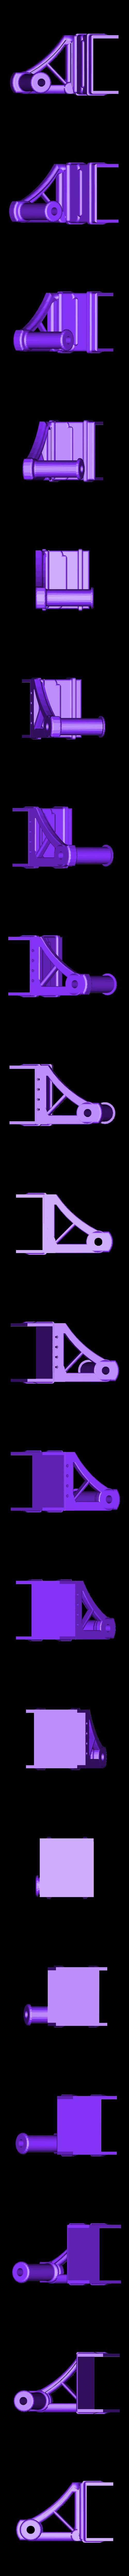 spool_holder.stl Download free STL file CR10 Spool Holder • 3D printer model, DragonflyFabrication